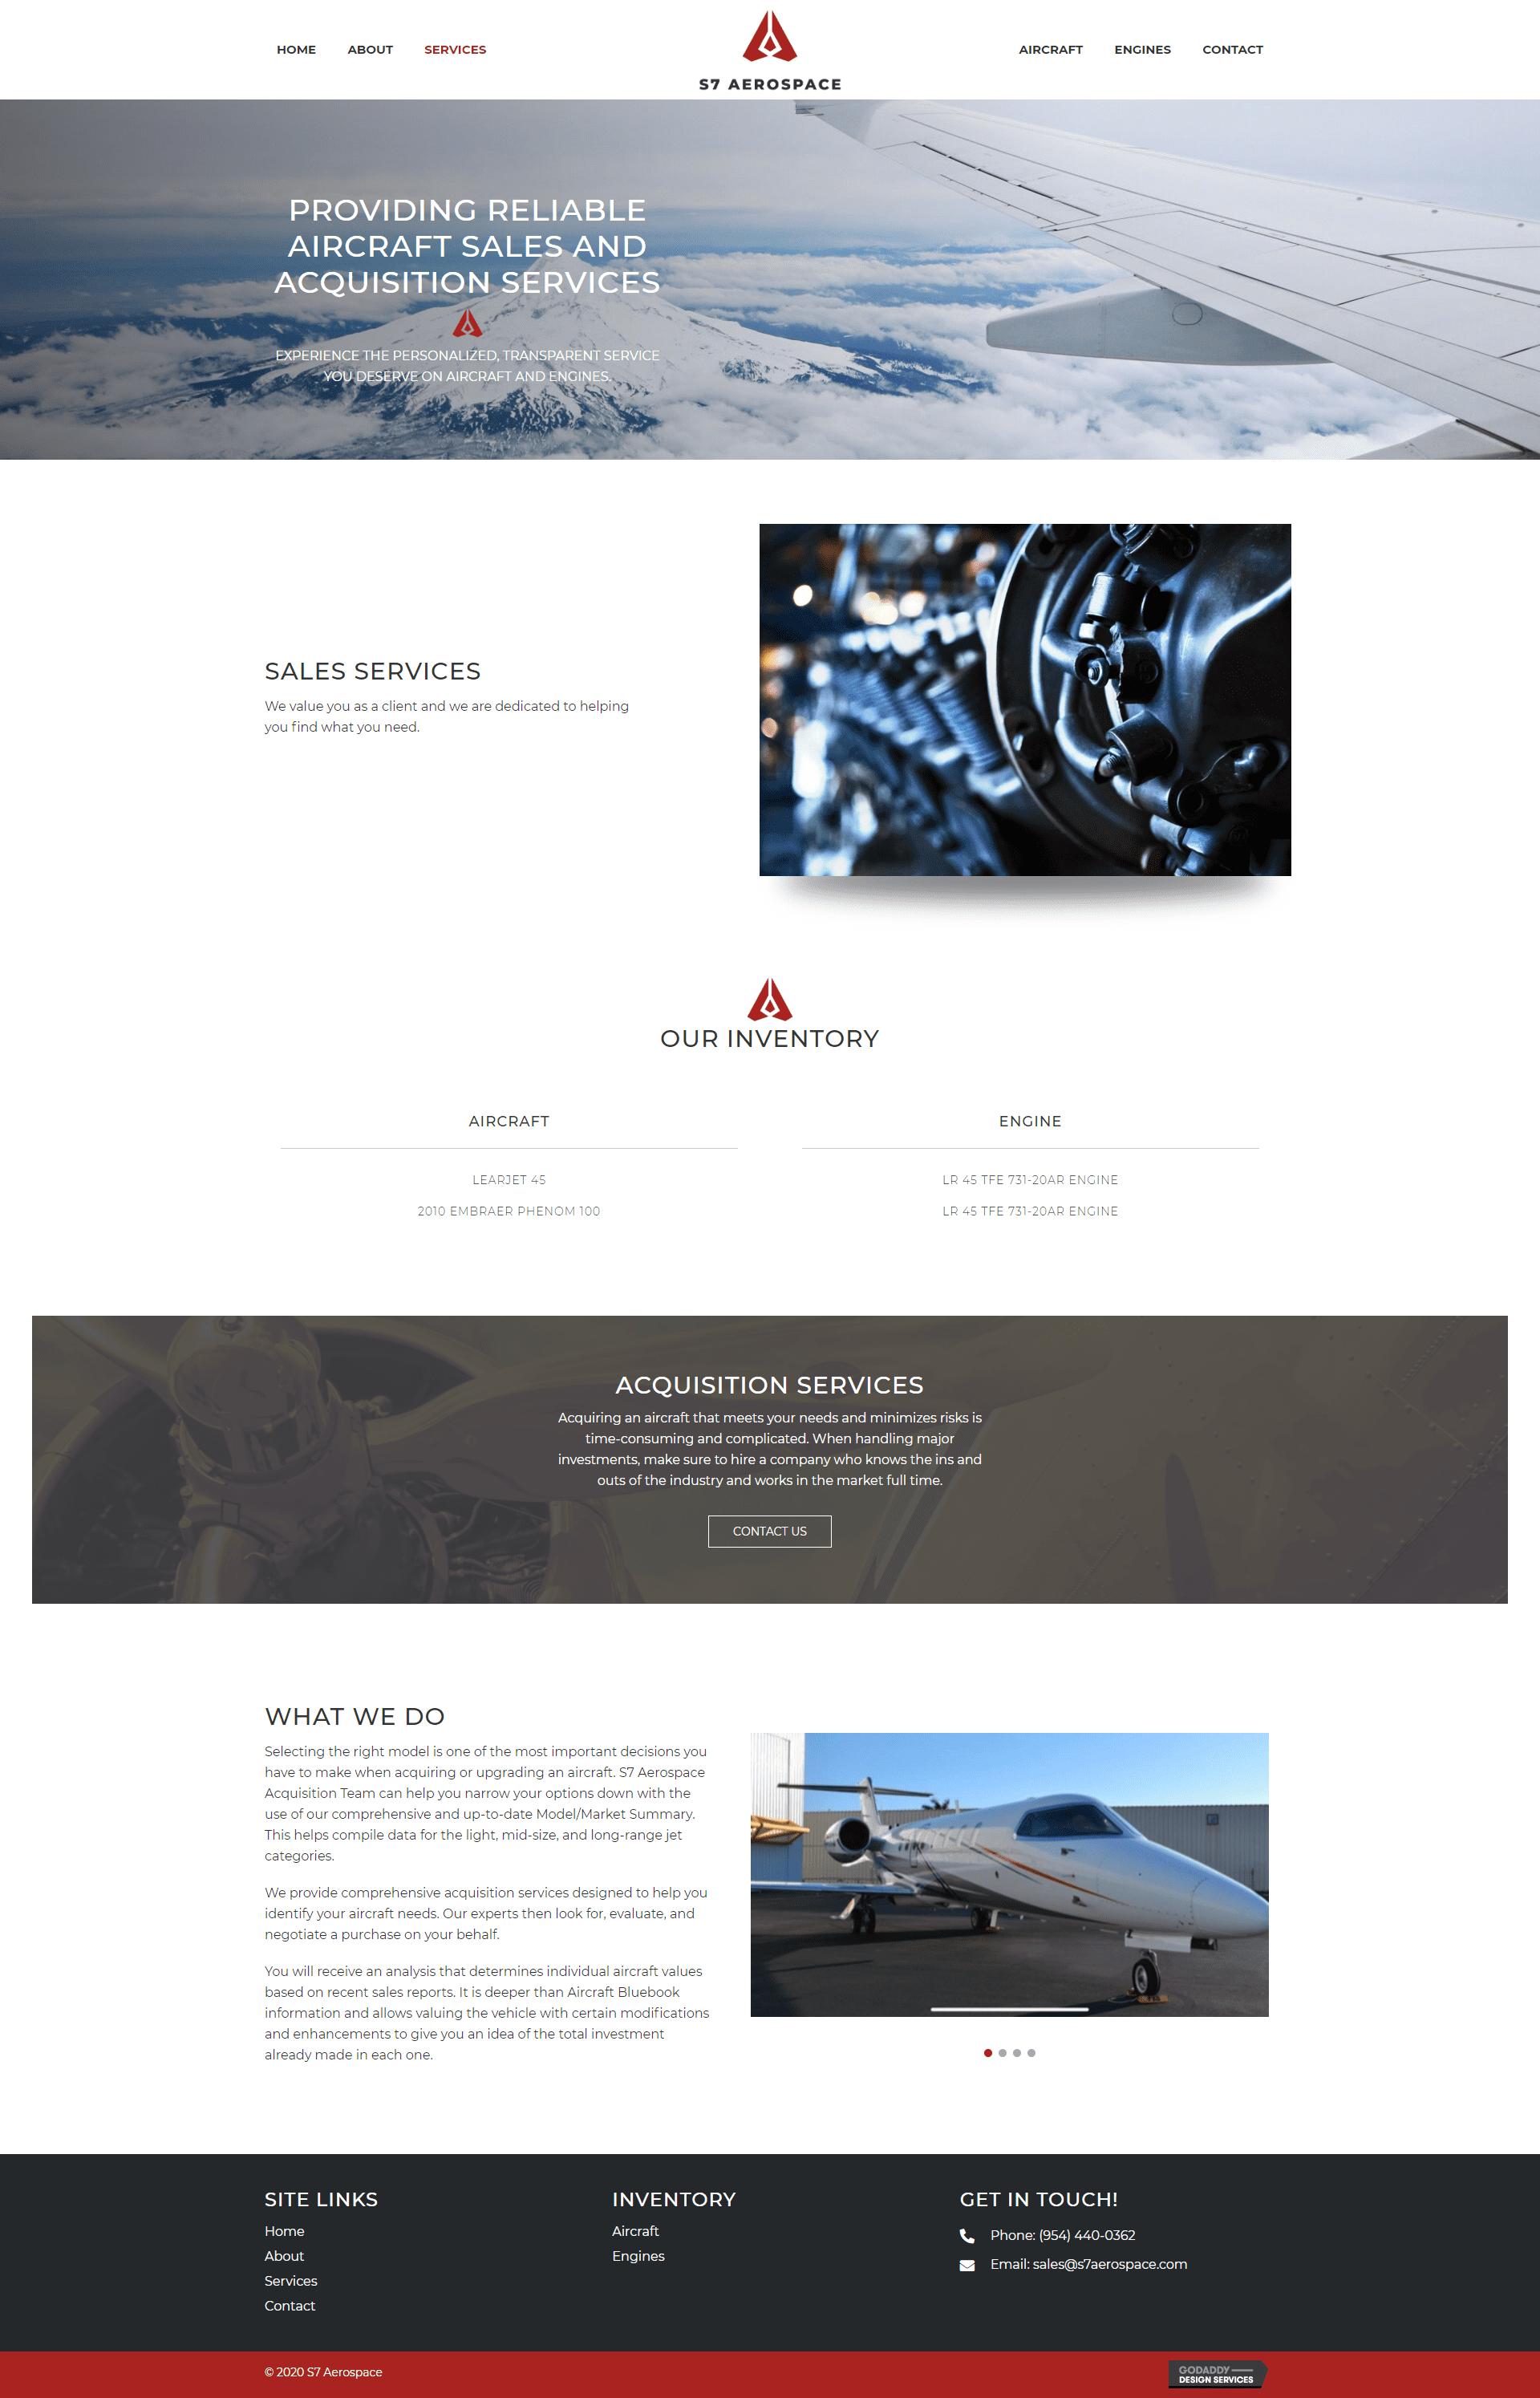 screencapture-umv-f18-myftpupload-services